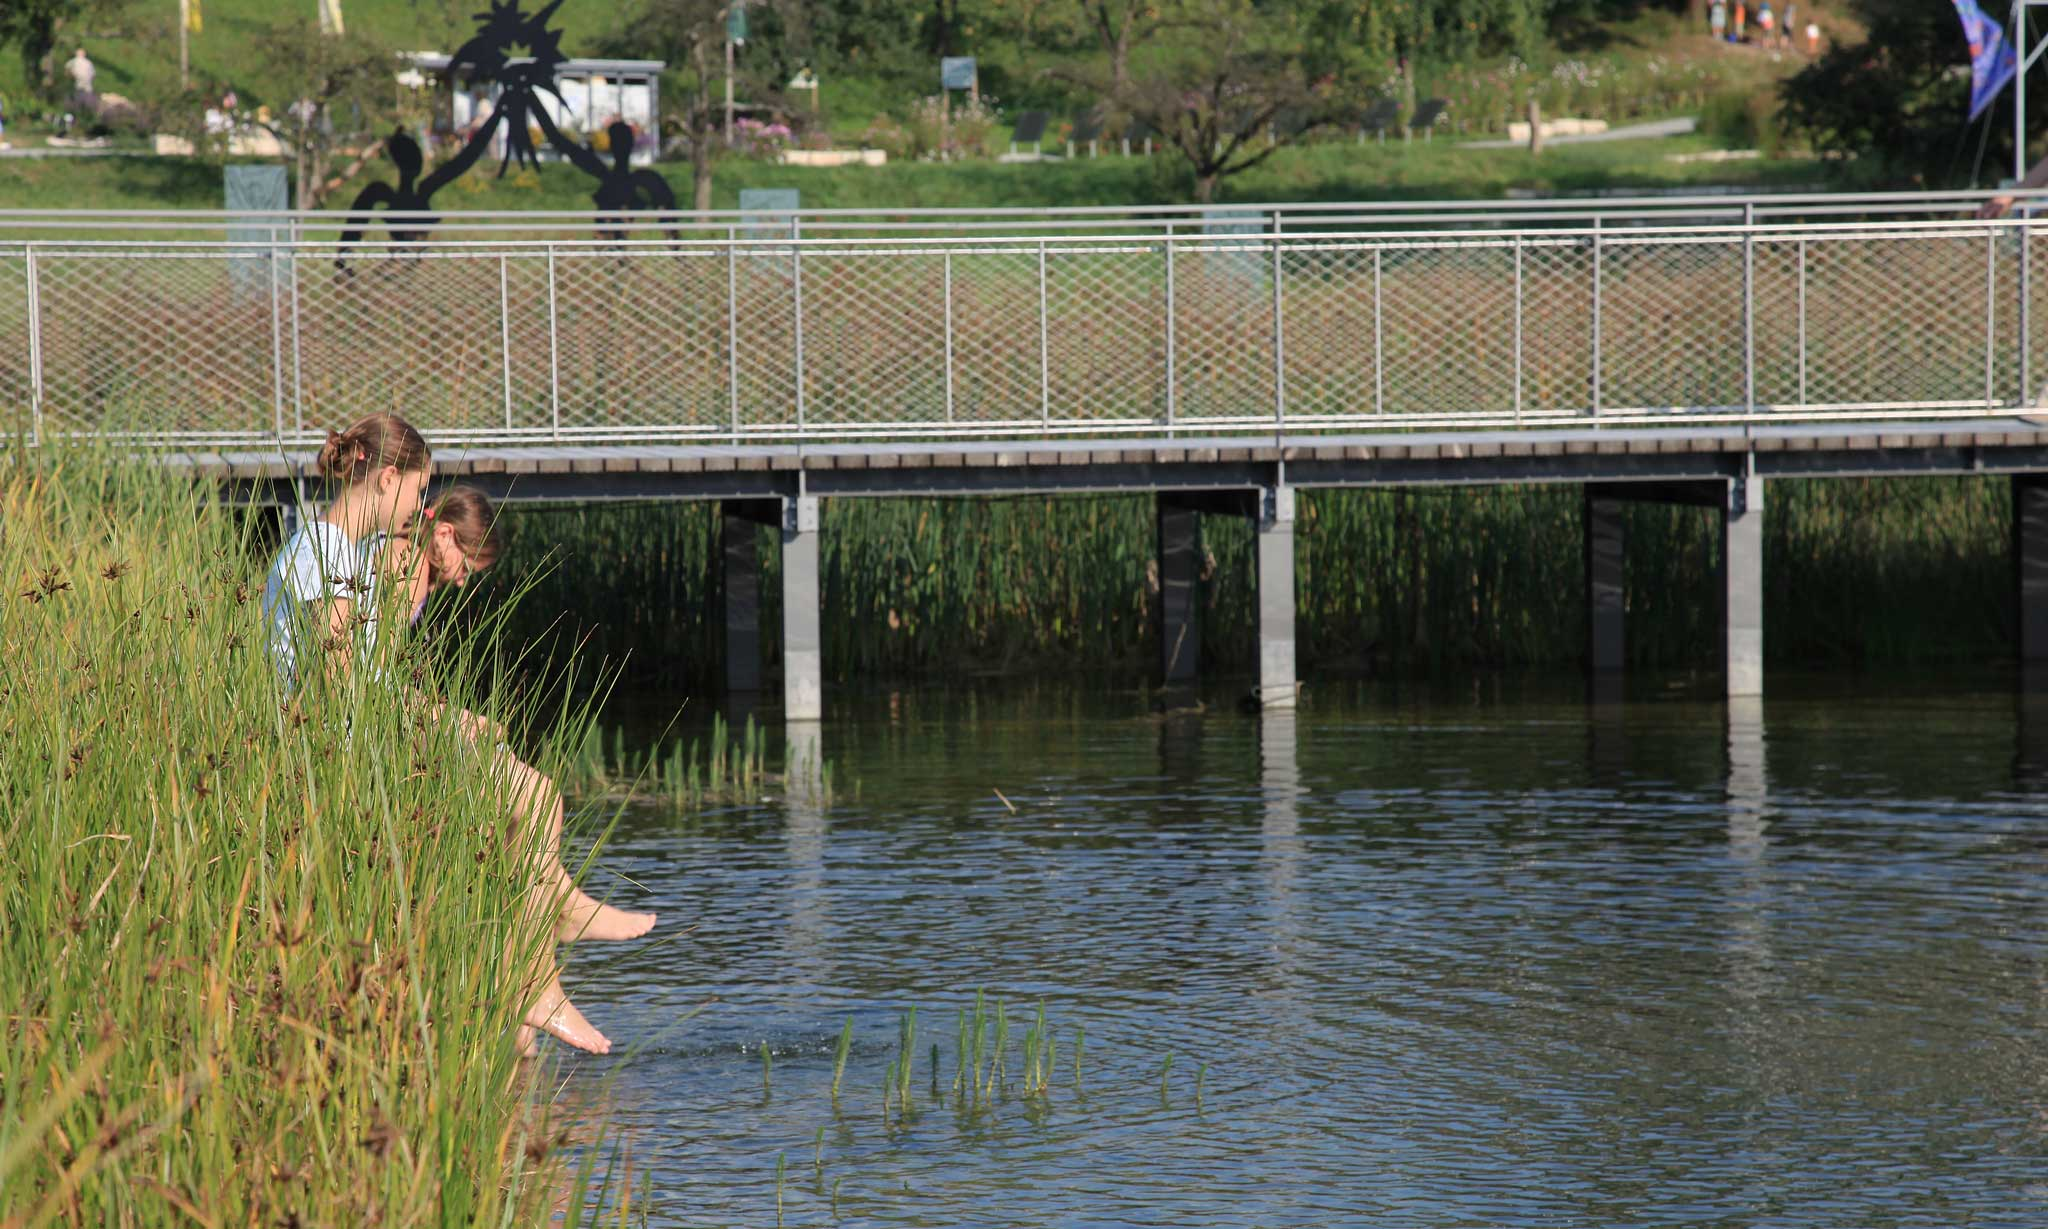 Grüne Mitte | Rechberghausen | Blick aufs Wasser